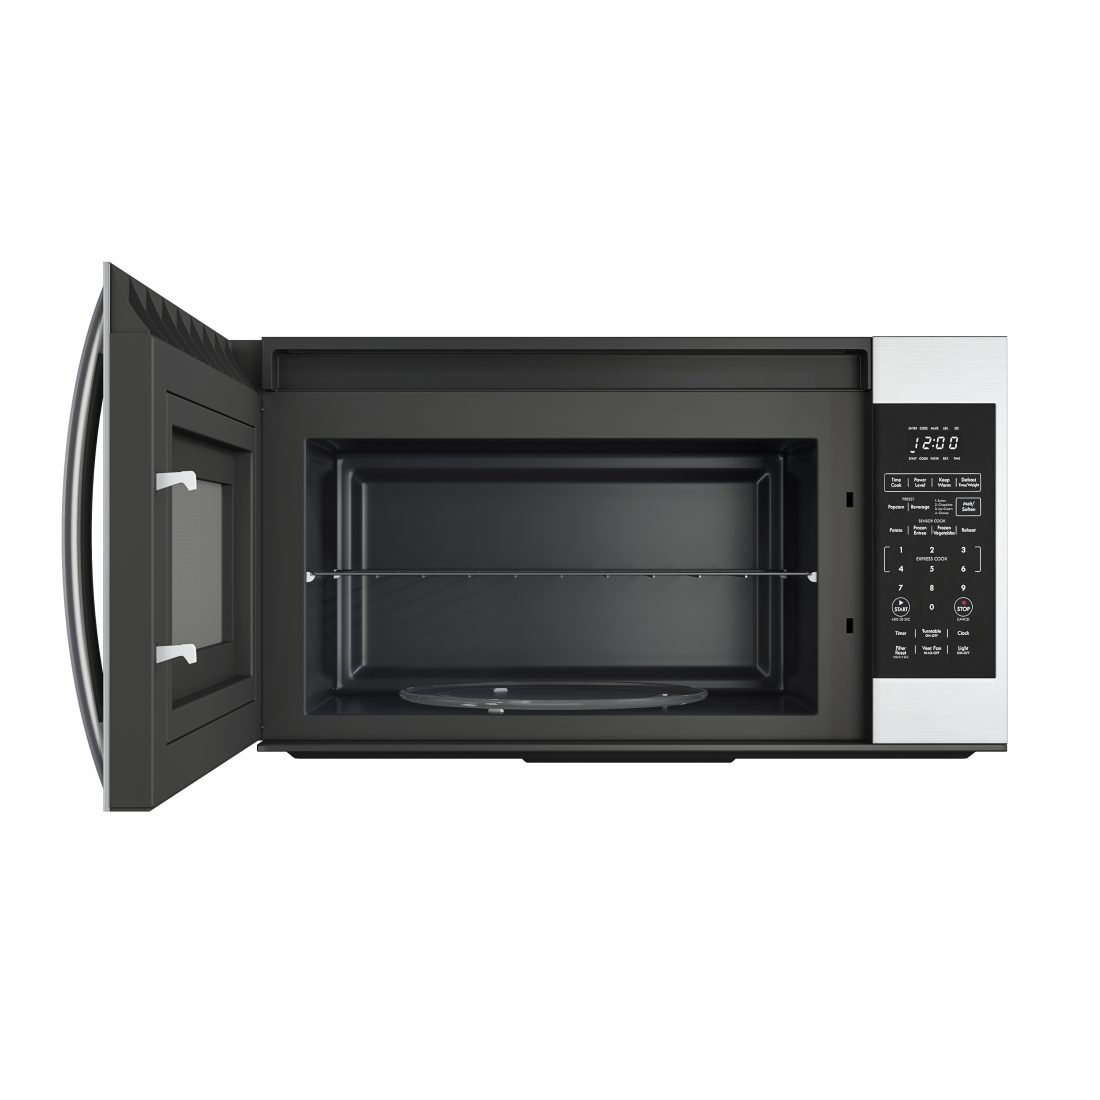 kenmore 83533 over range microwave 3d